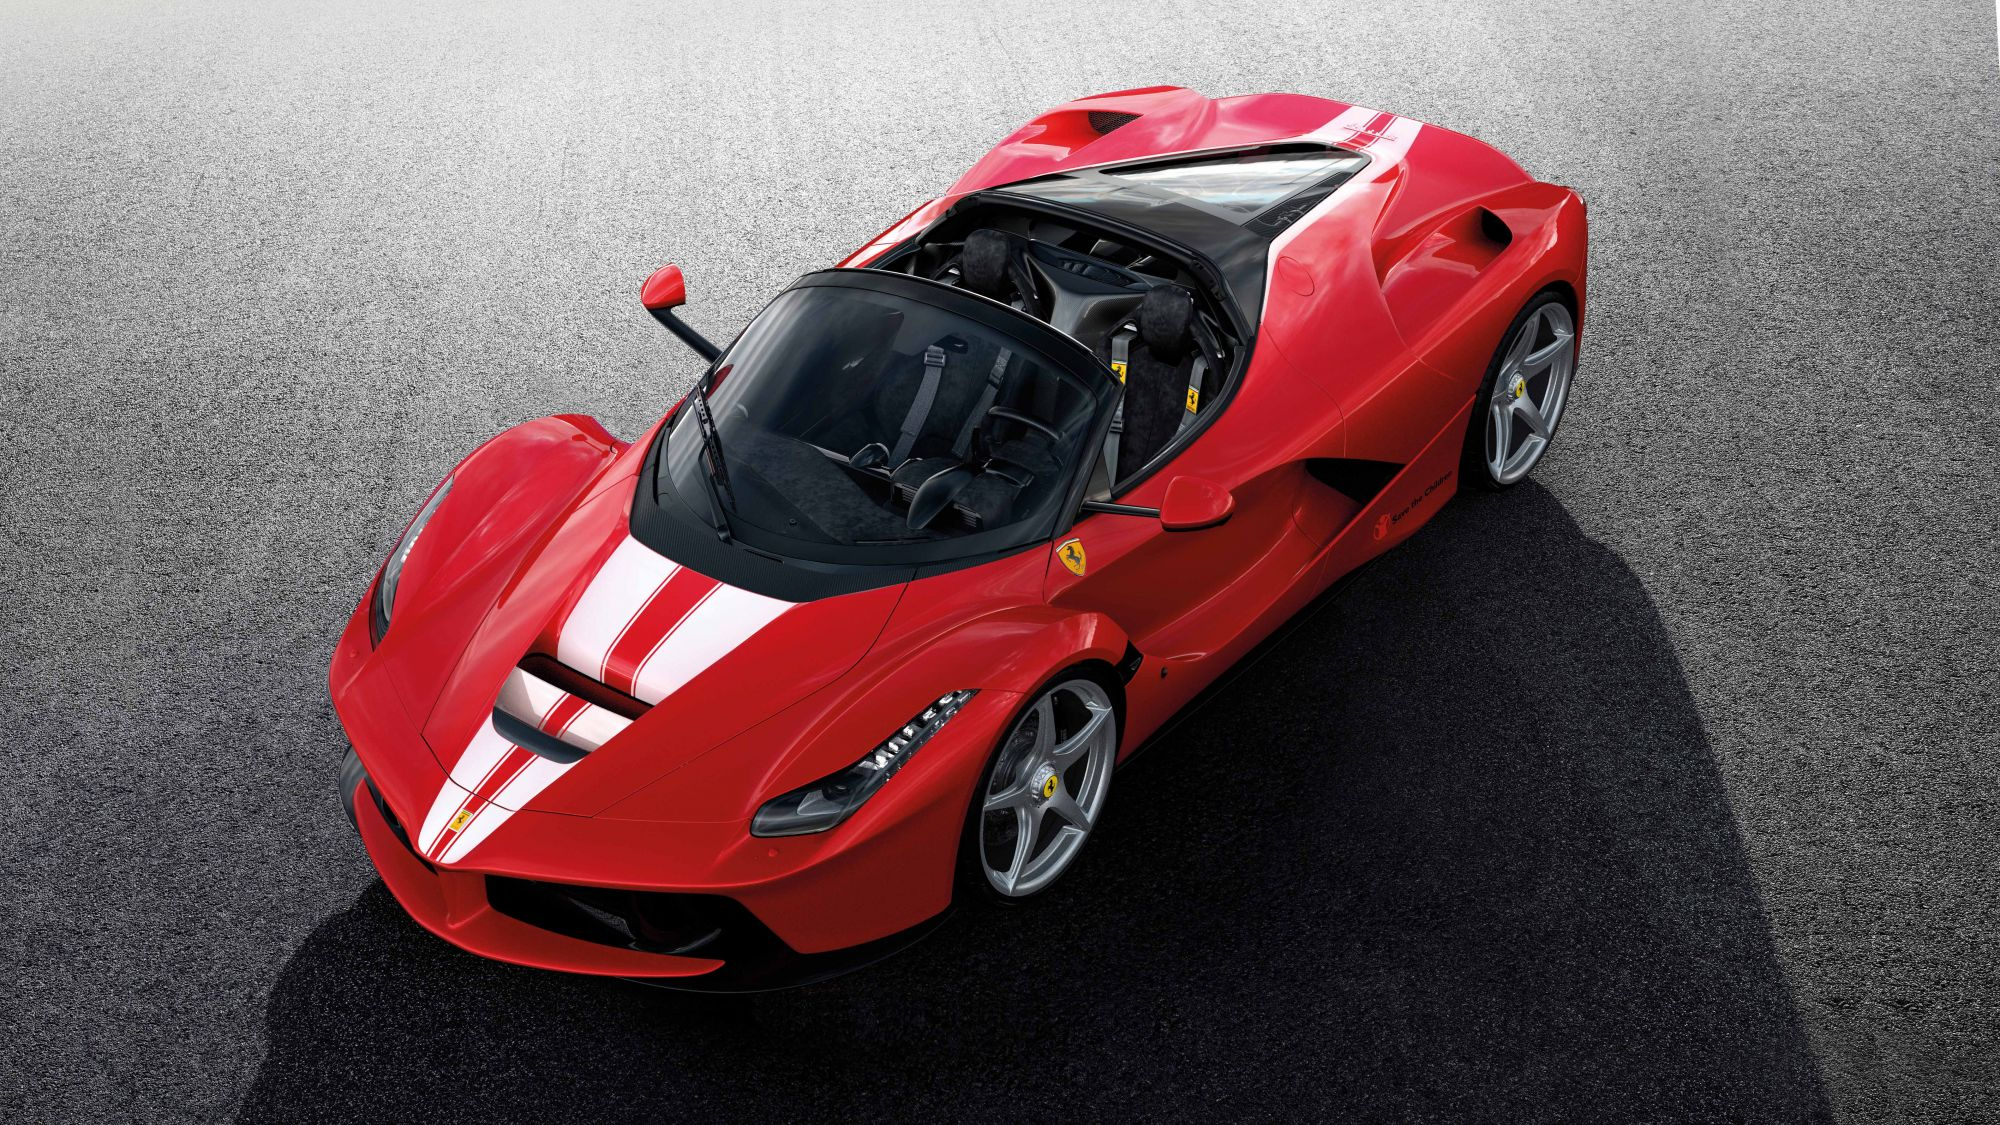 Ferrari Celebrates Their 70th Birthday In Style